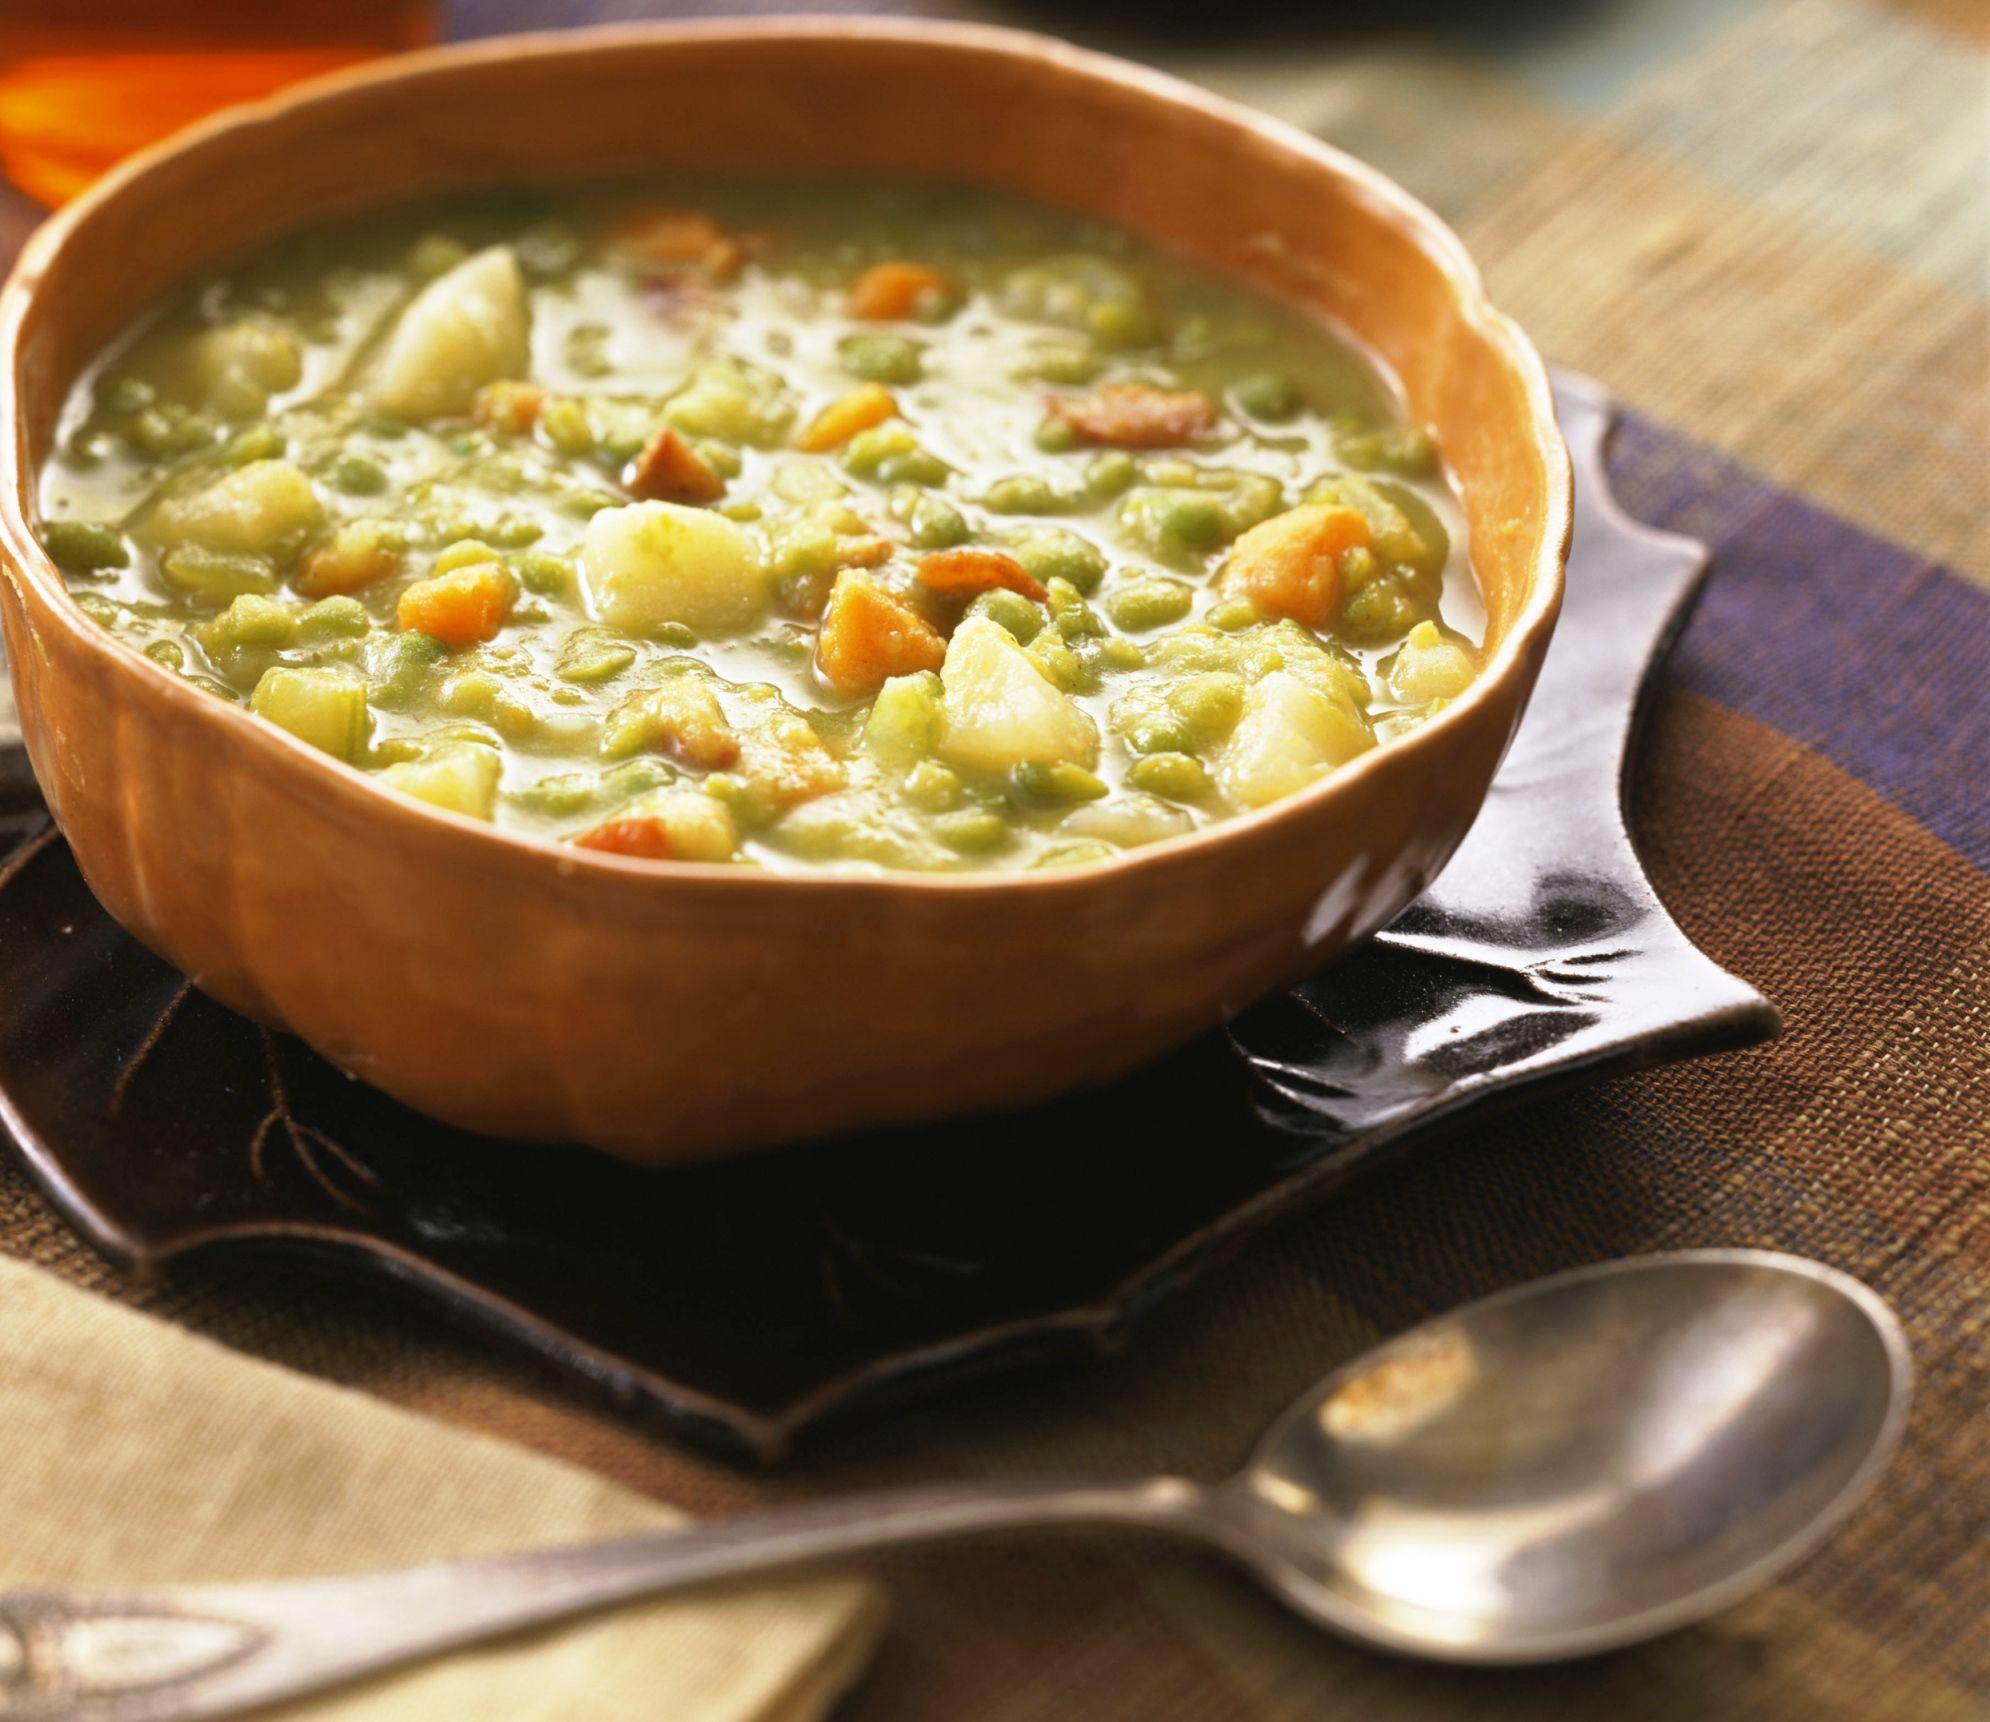 Vegetarian Fat-free Crock Pot Split Pea Soup Recipe